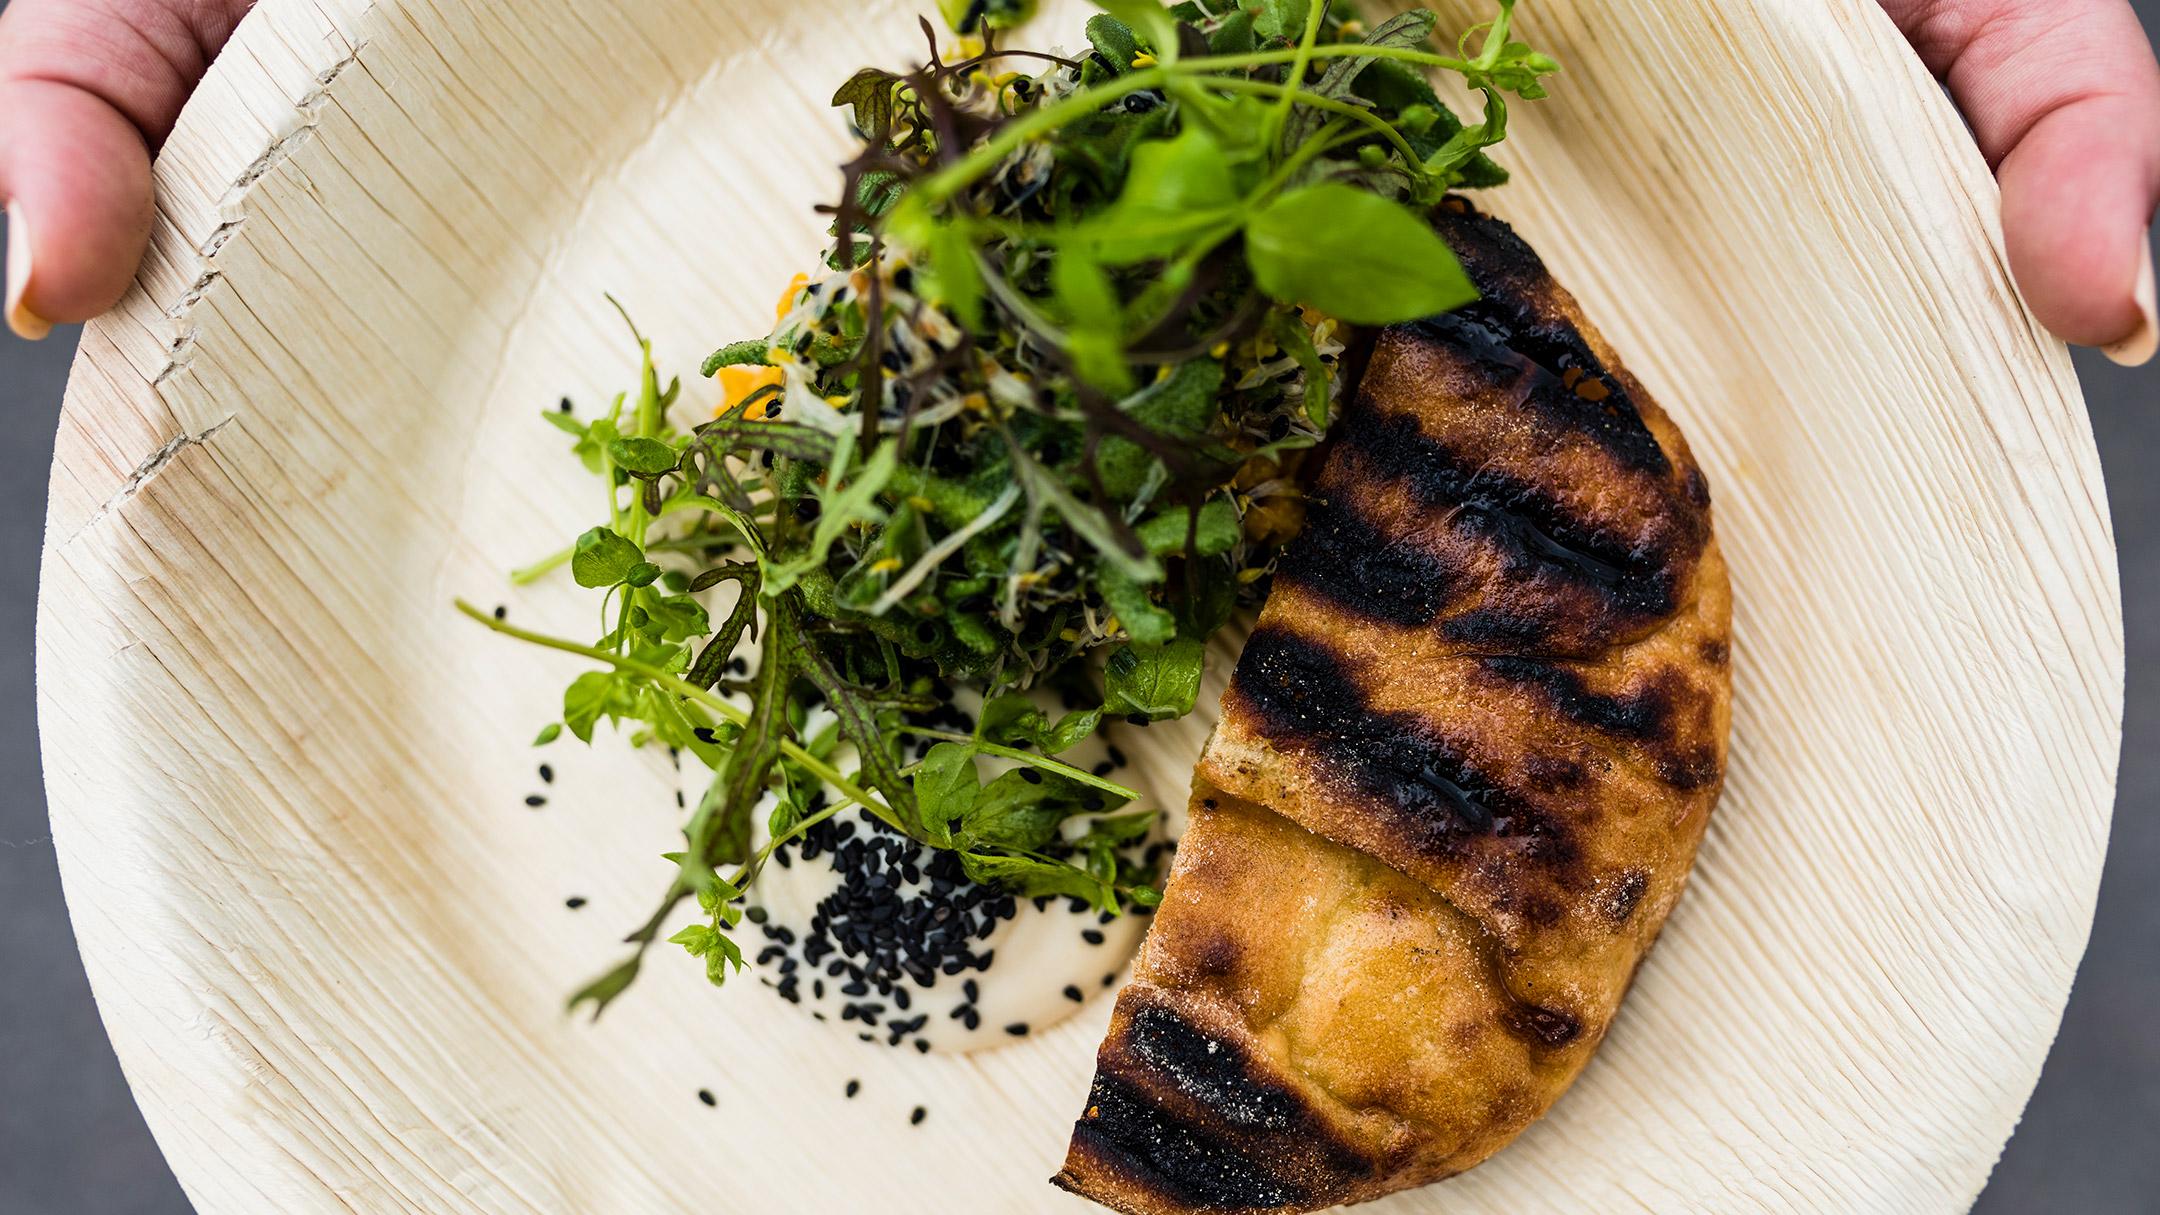 Flatbread meal by restaurant Shelter